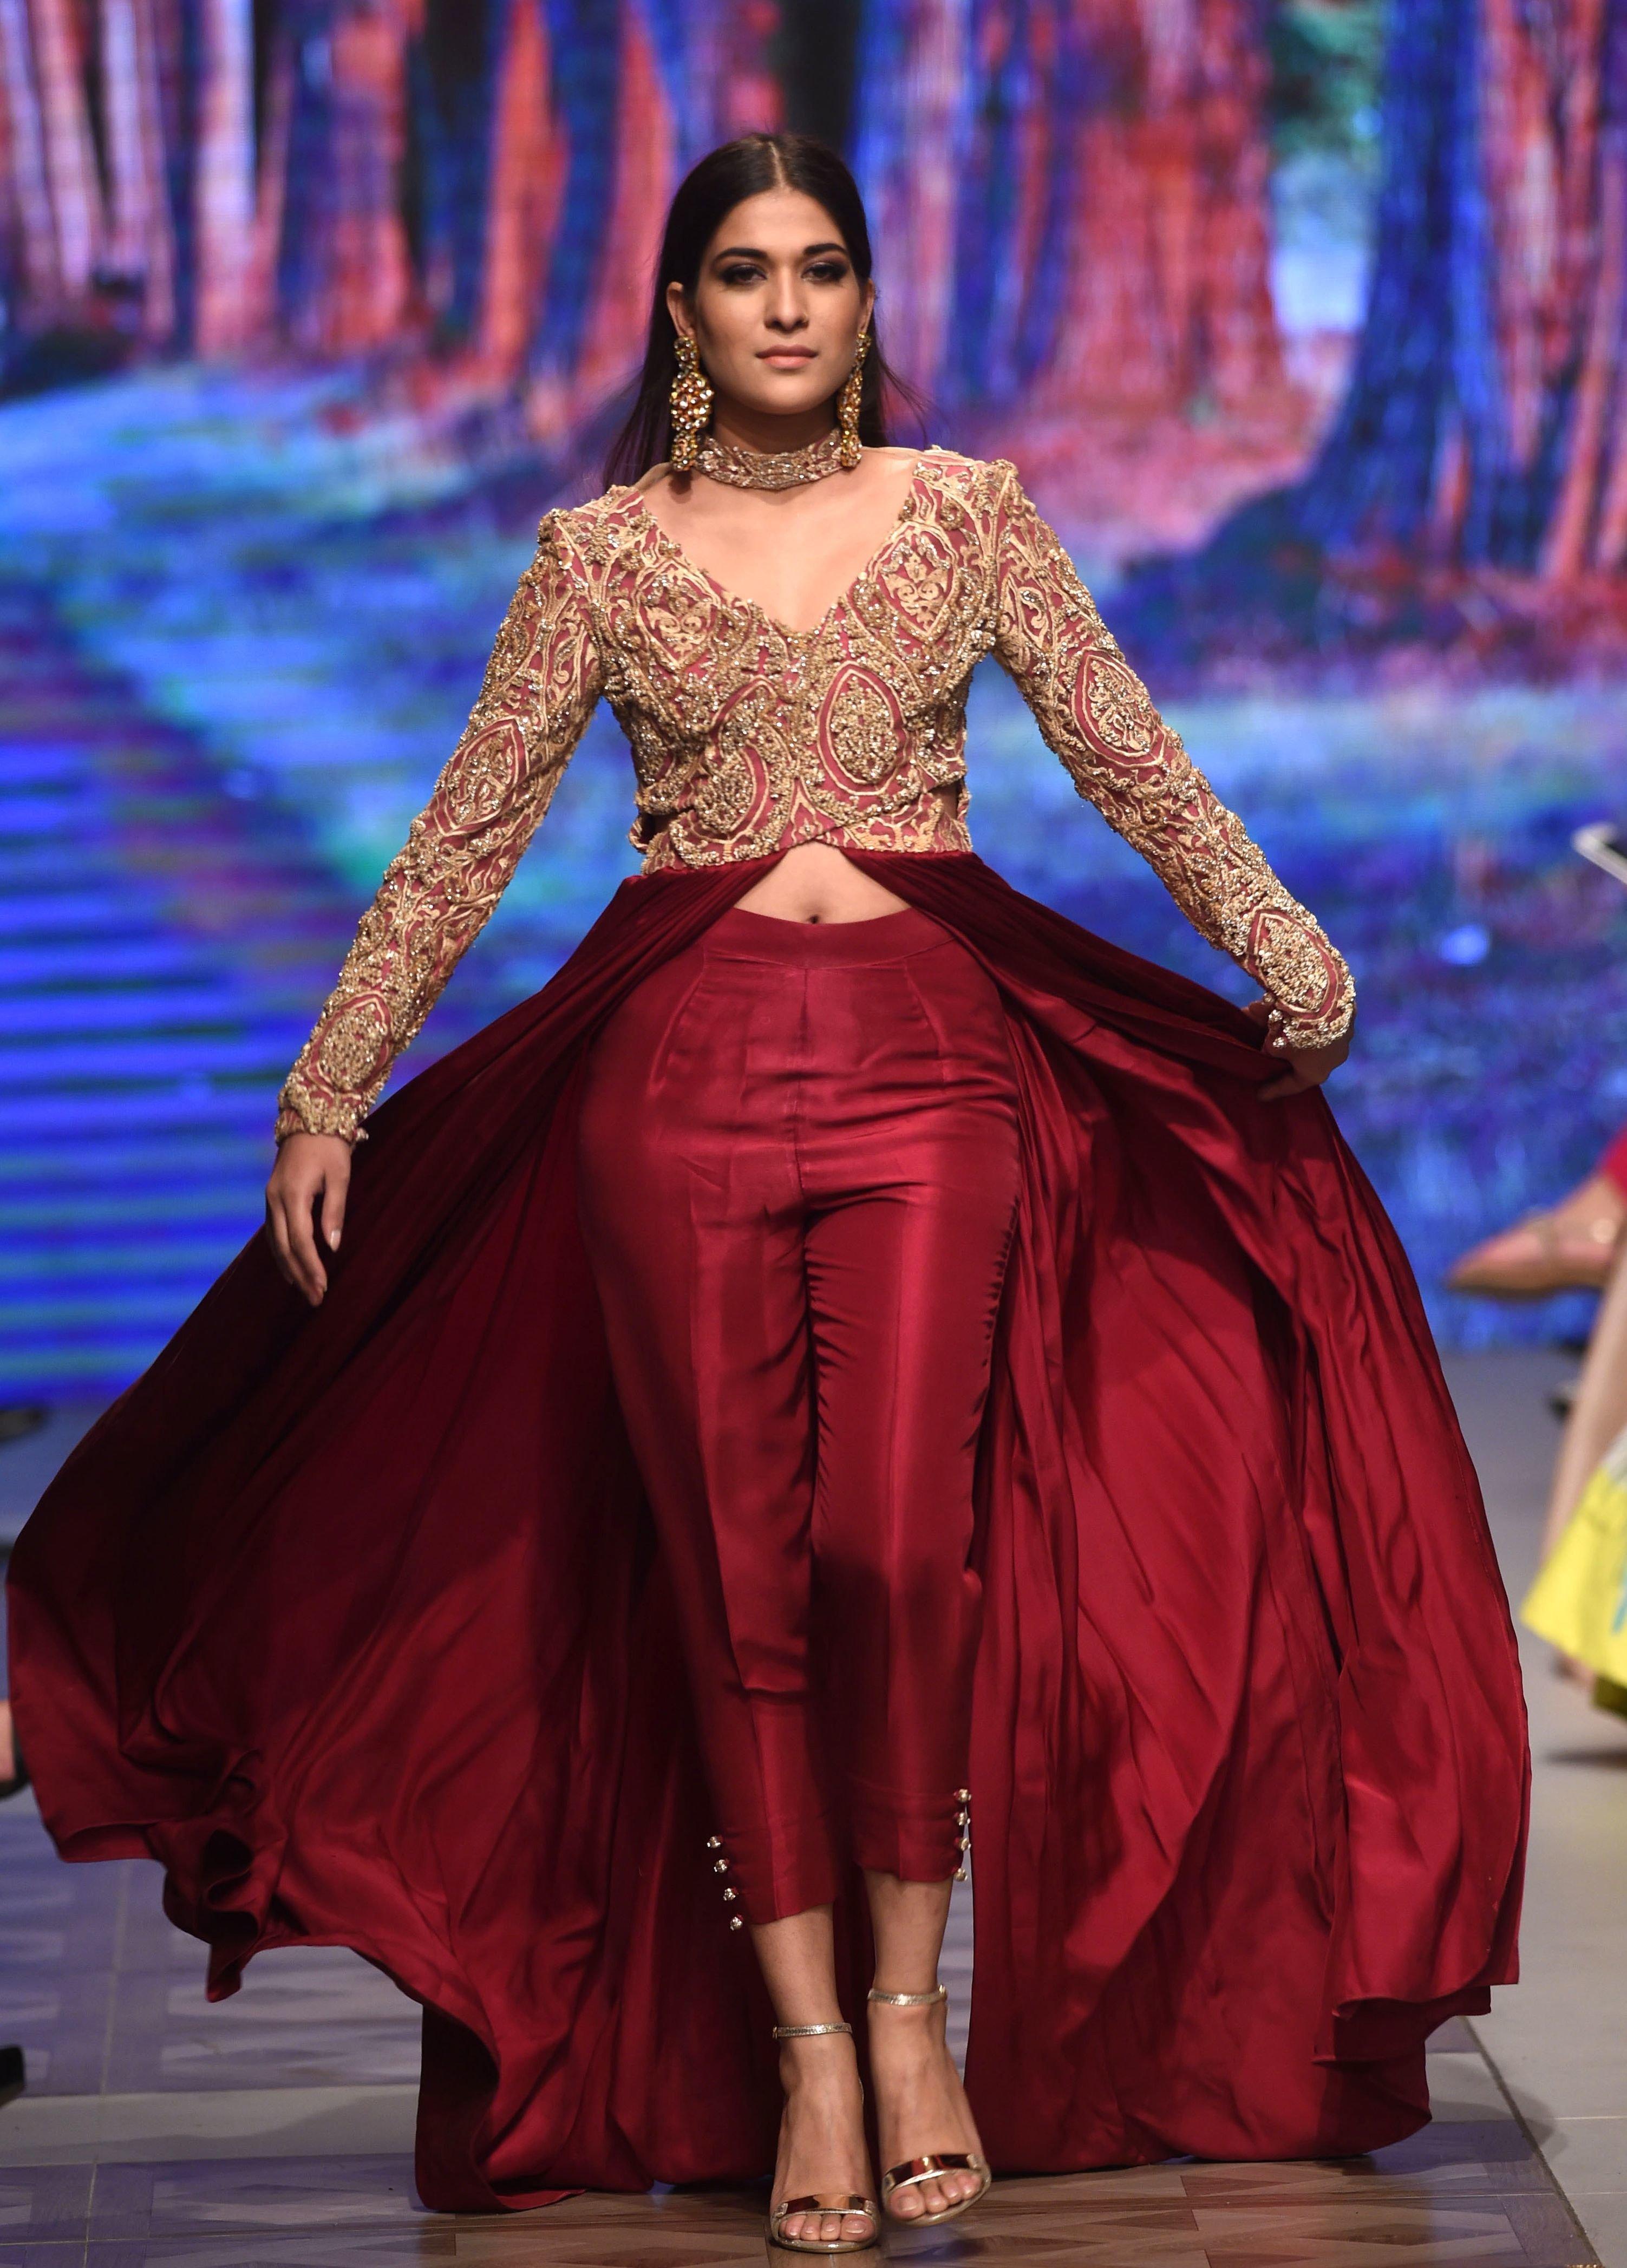 Jeeto Pakistan 2018 Passes and Registration Online Ali fawaz fashion designer